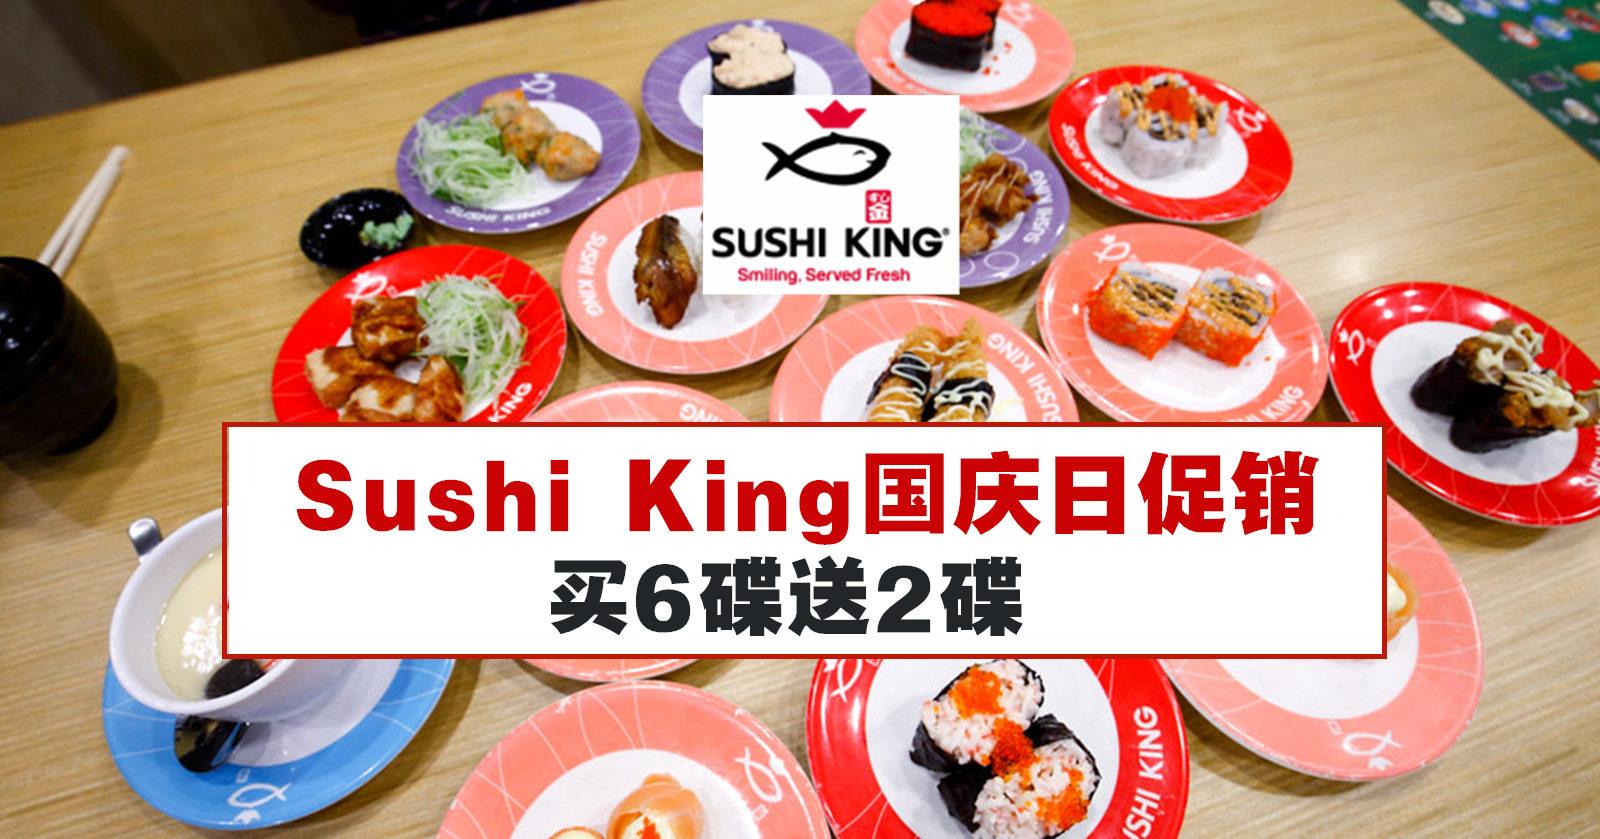 Sushi King国庆日促销,买6碟送2碟